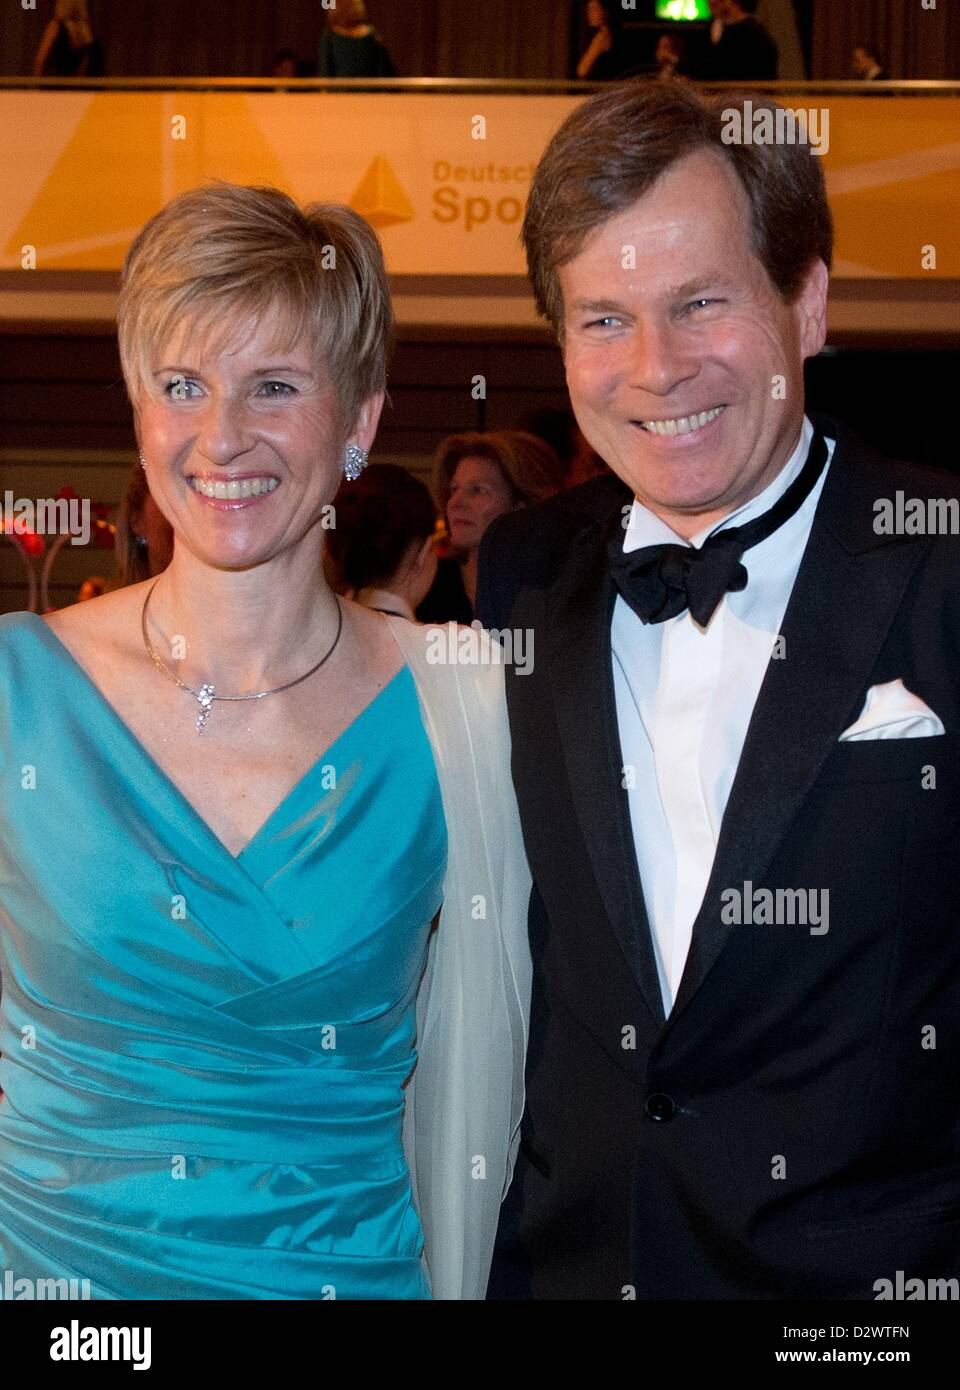 Klatten jan Richest Germans: